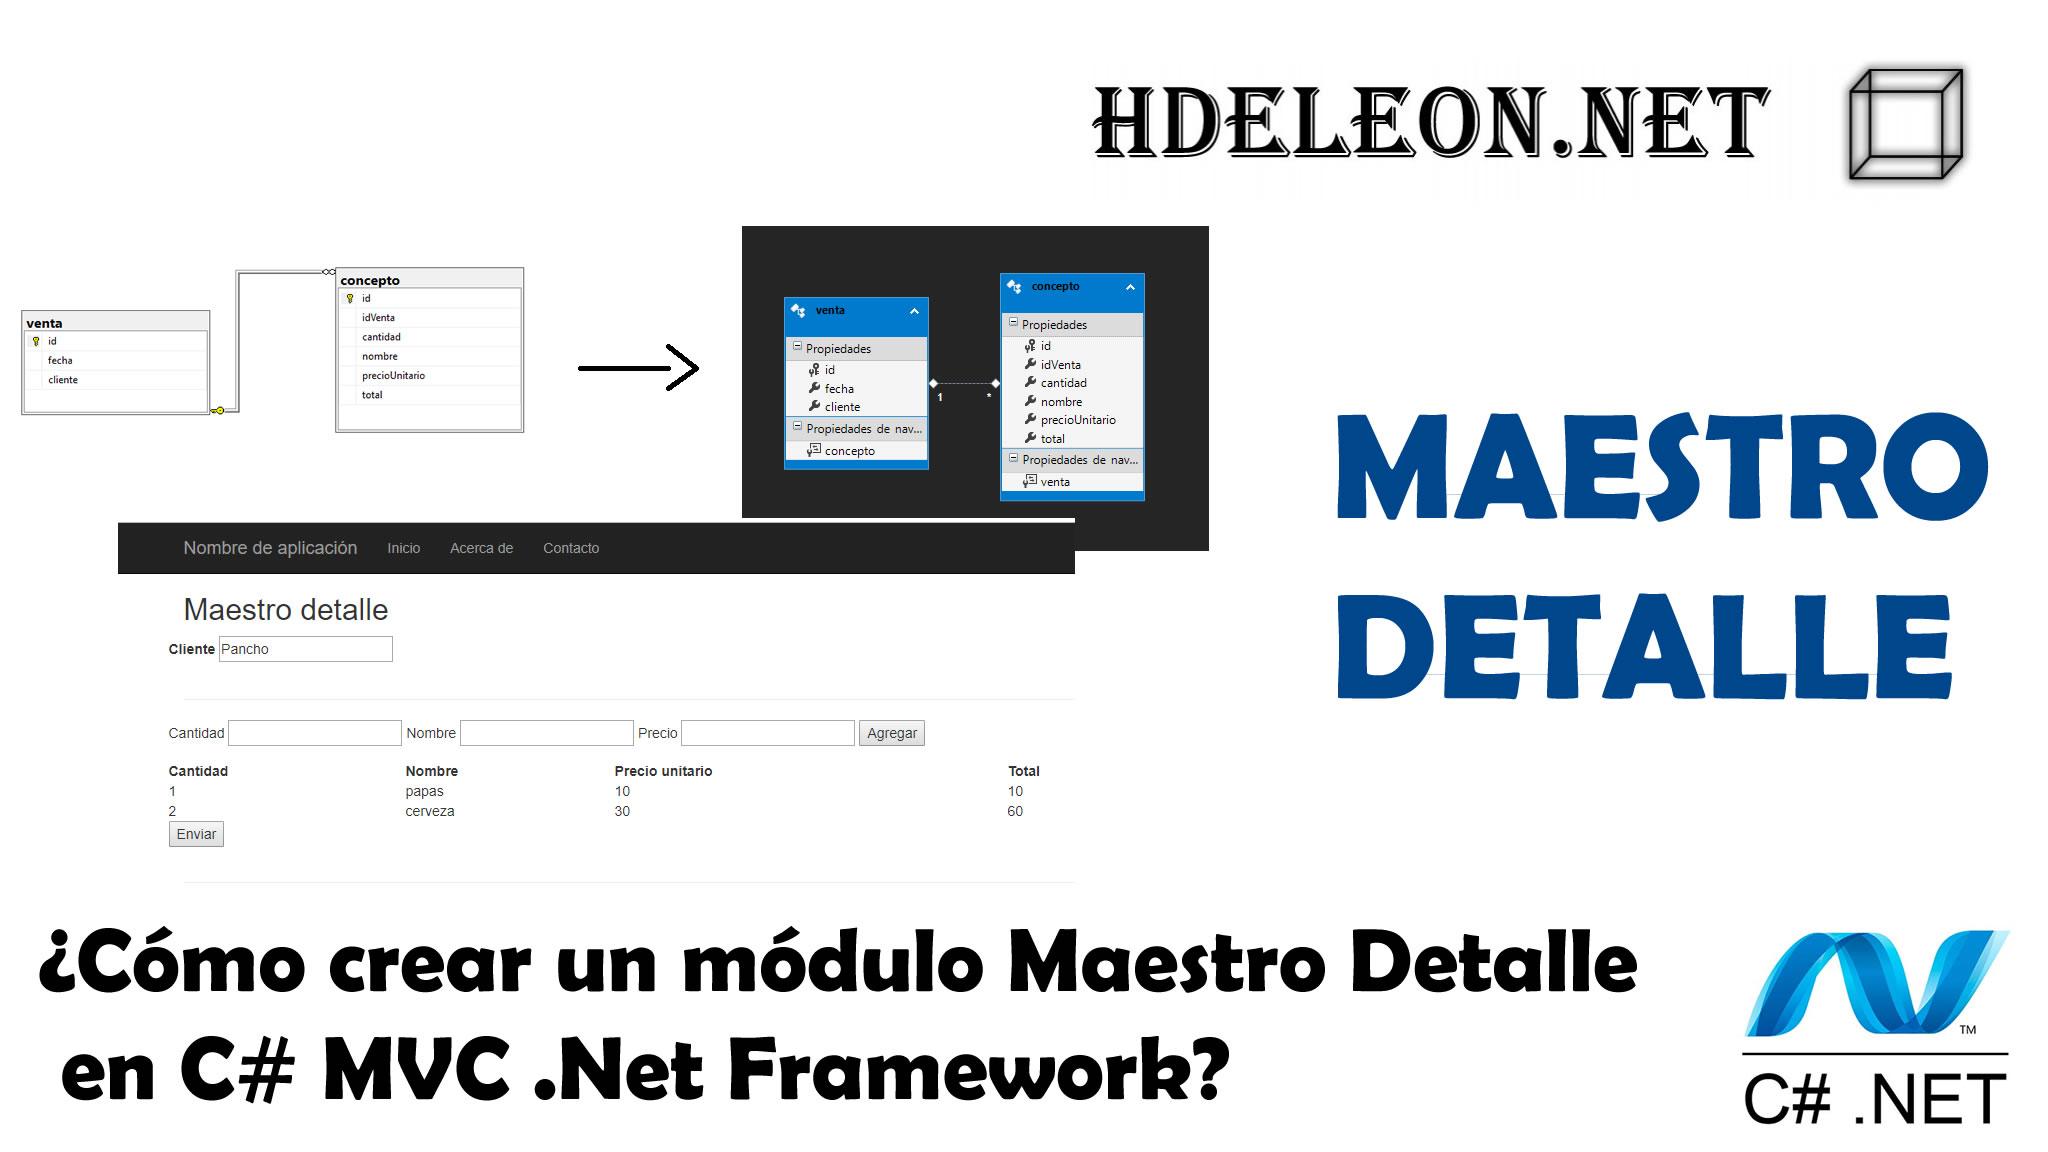 ¿Cómo crear un módulo Maestro Detalle en C# MVC .Net Framework?